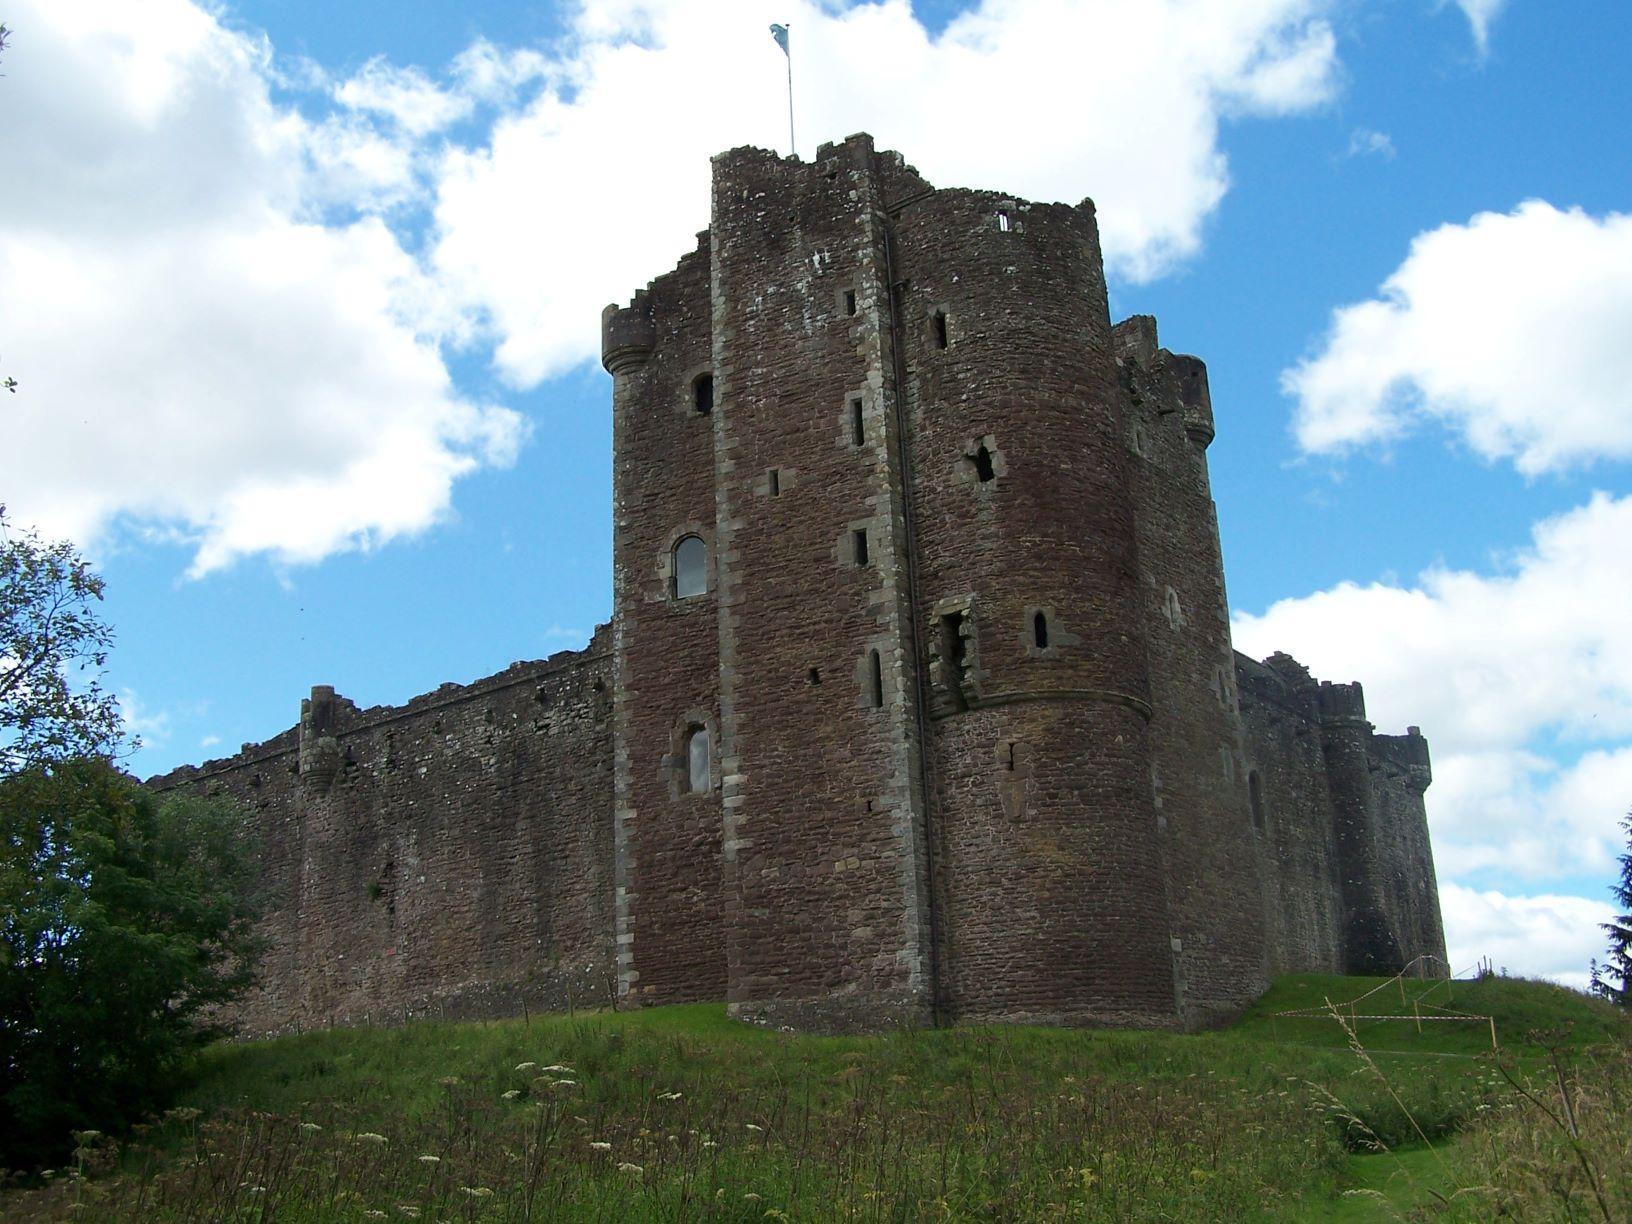 visit dounce castle by electric bike